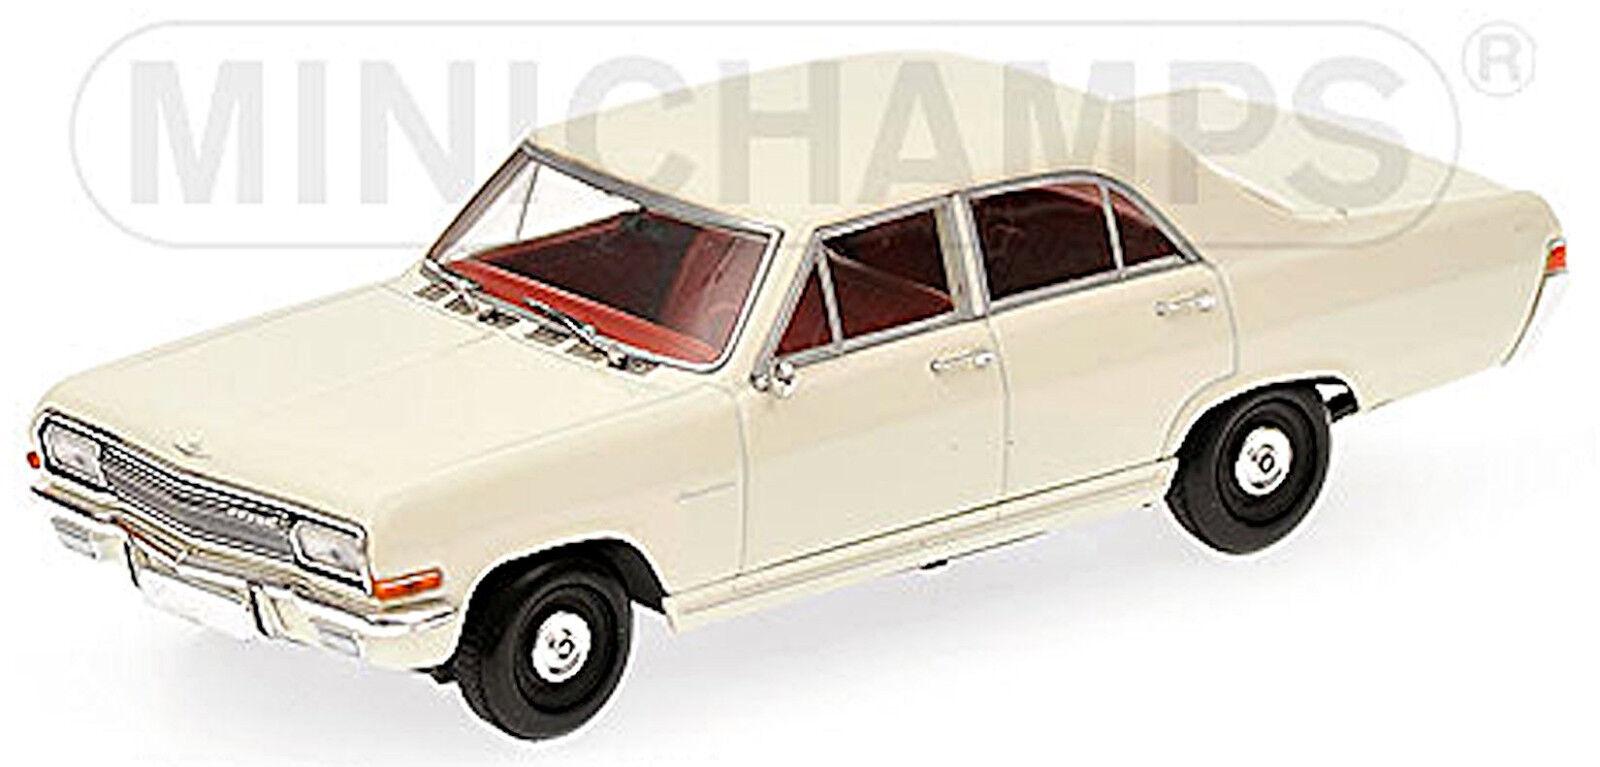 Opel capitaine a 1964-68 Chamonix Blanc blanc 1 43 Minichamps